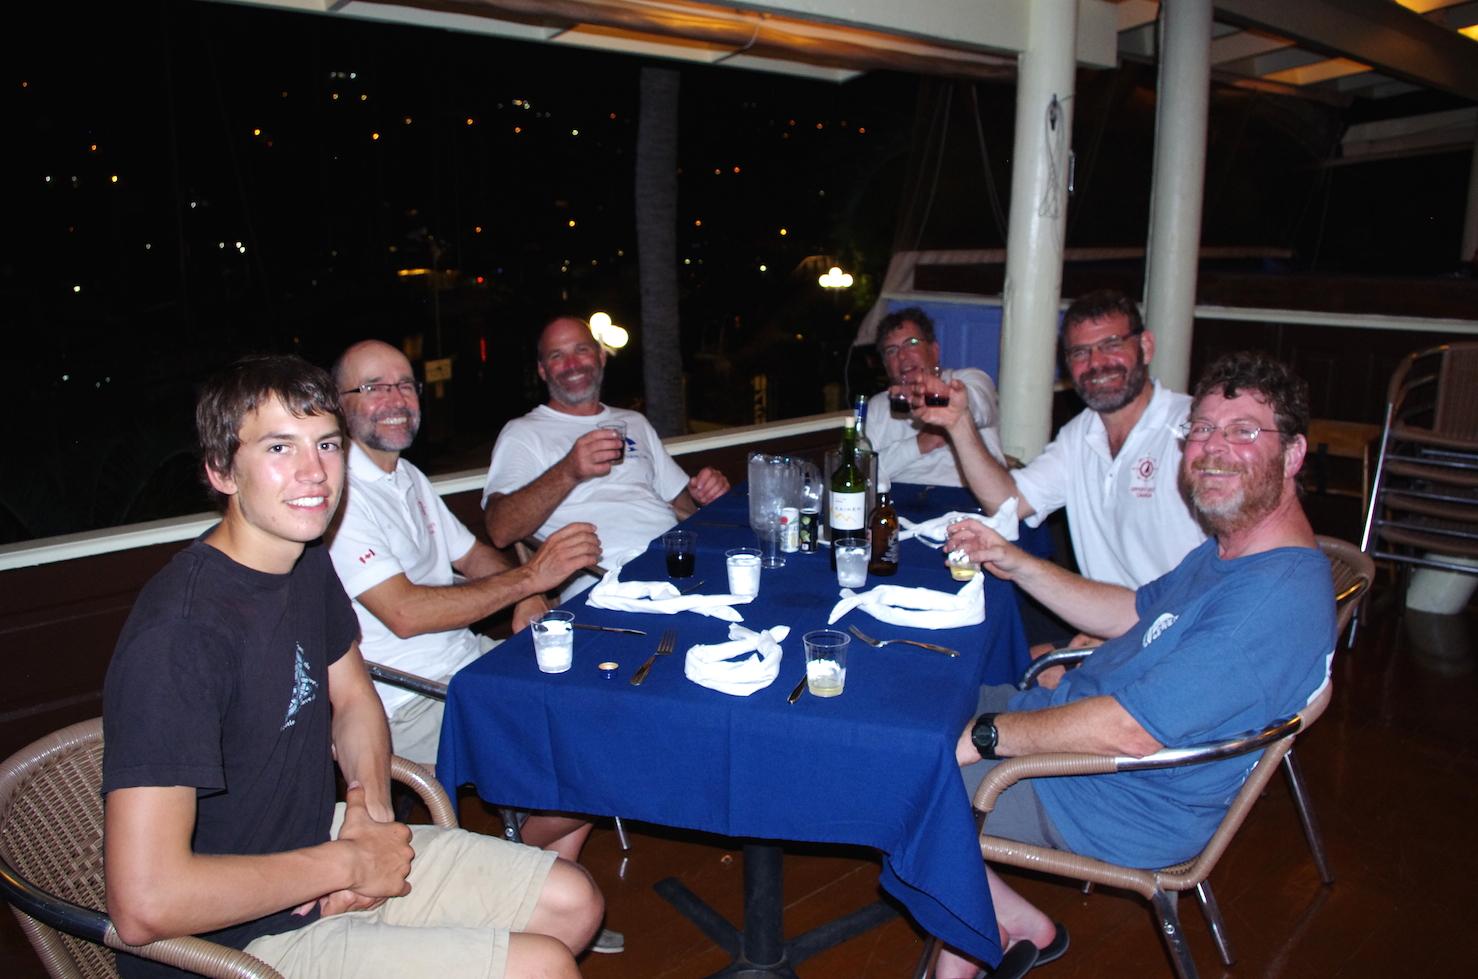 2014_C1500_Nanny Cay_Prizegiving_Dinner at Peg Leg (1).JPG